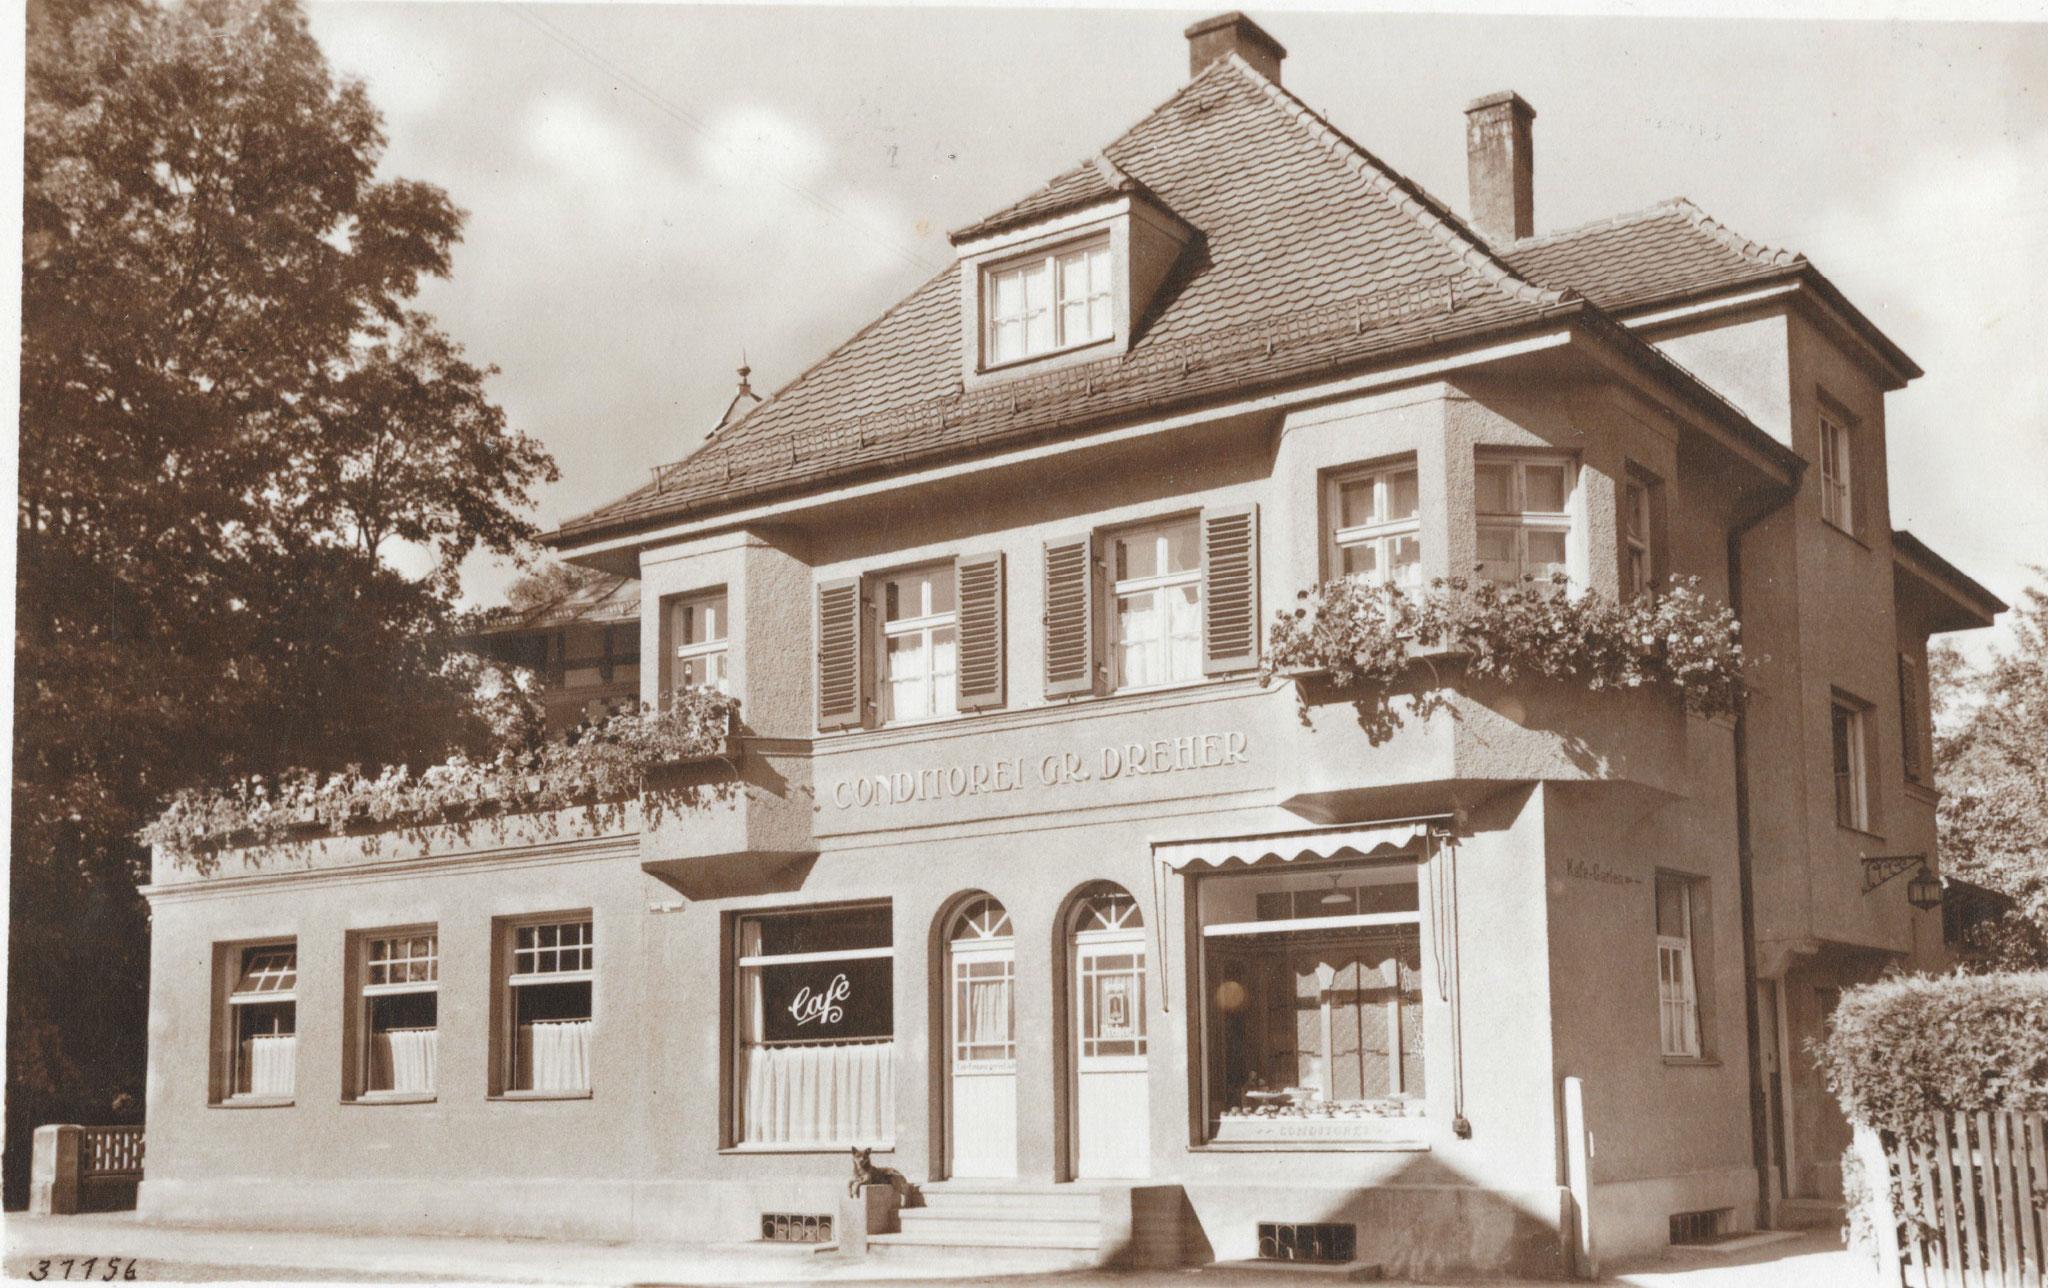 Konditorei Dreher (Hofmair) Tutzing, Foto um 1930